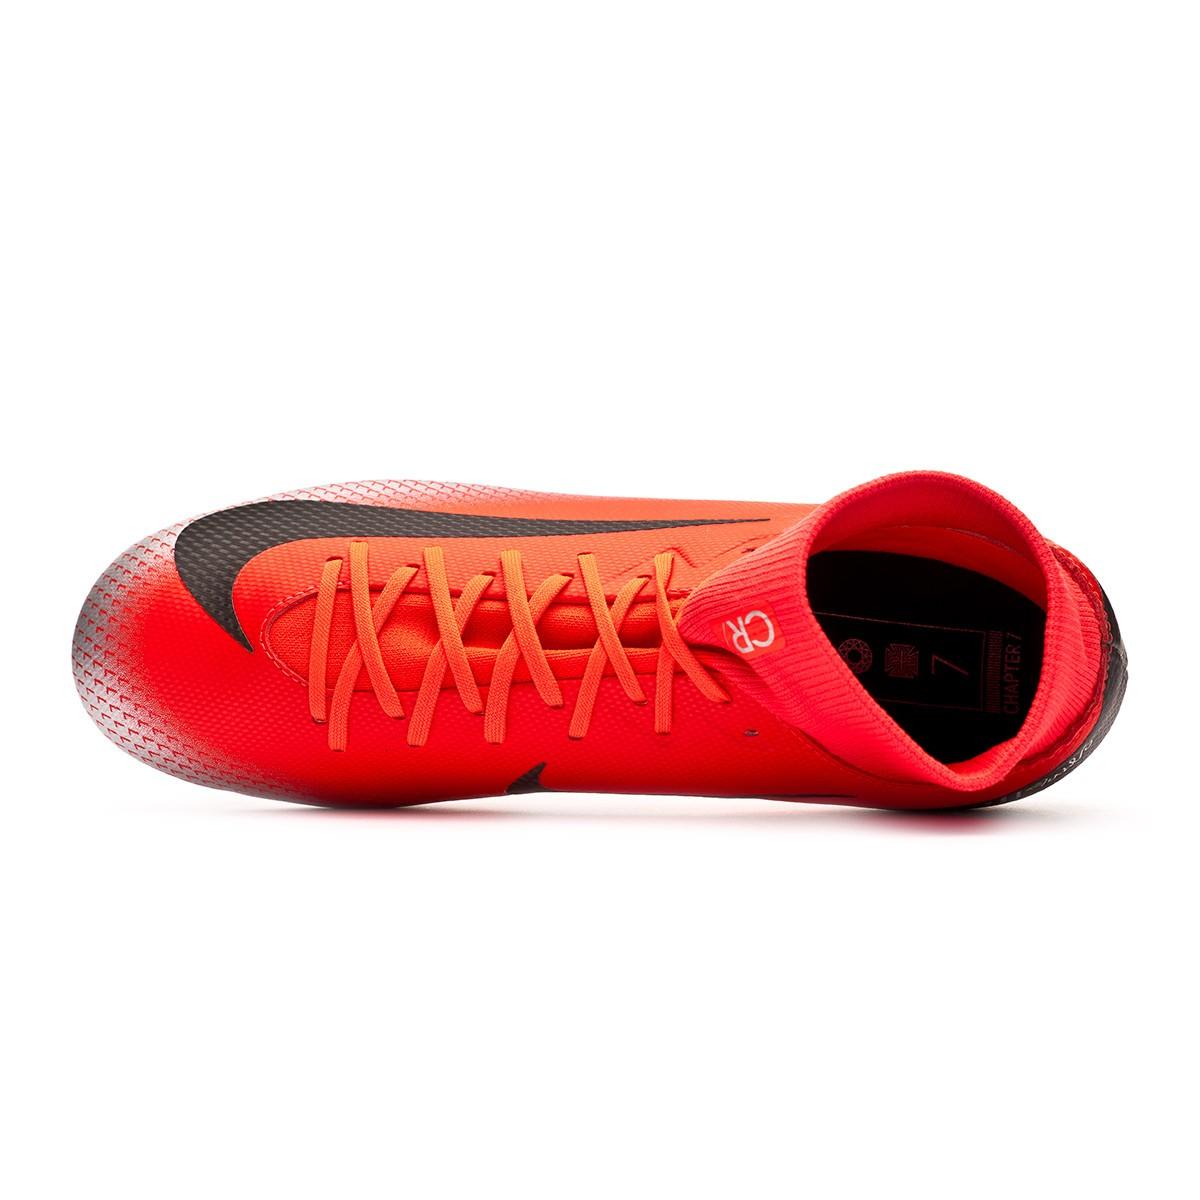 818a352e778 Zapatos de fútbol Nike Mercurial Superfly VI Academy CR7 SG-Pro Bright  crimson-Black-Chrome-Dark grey - Tienda de fútbol Fútbol Emotion